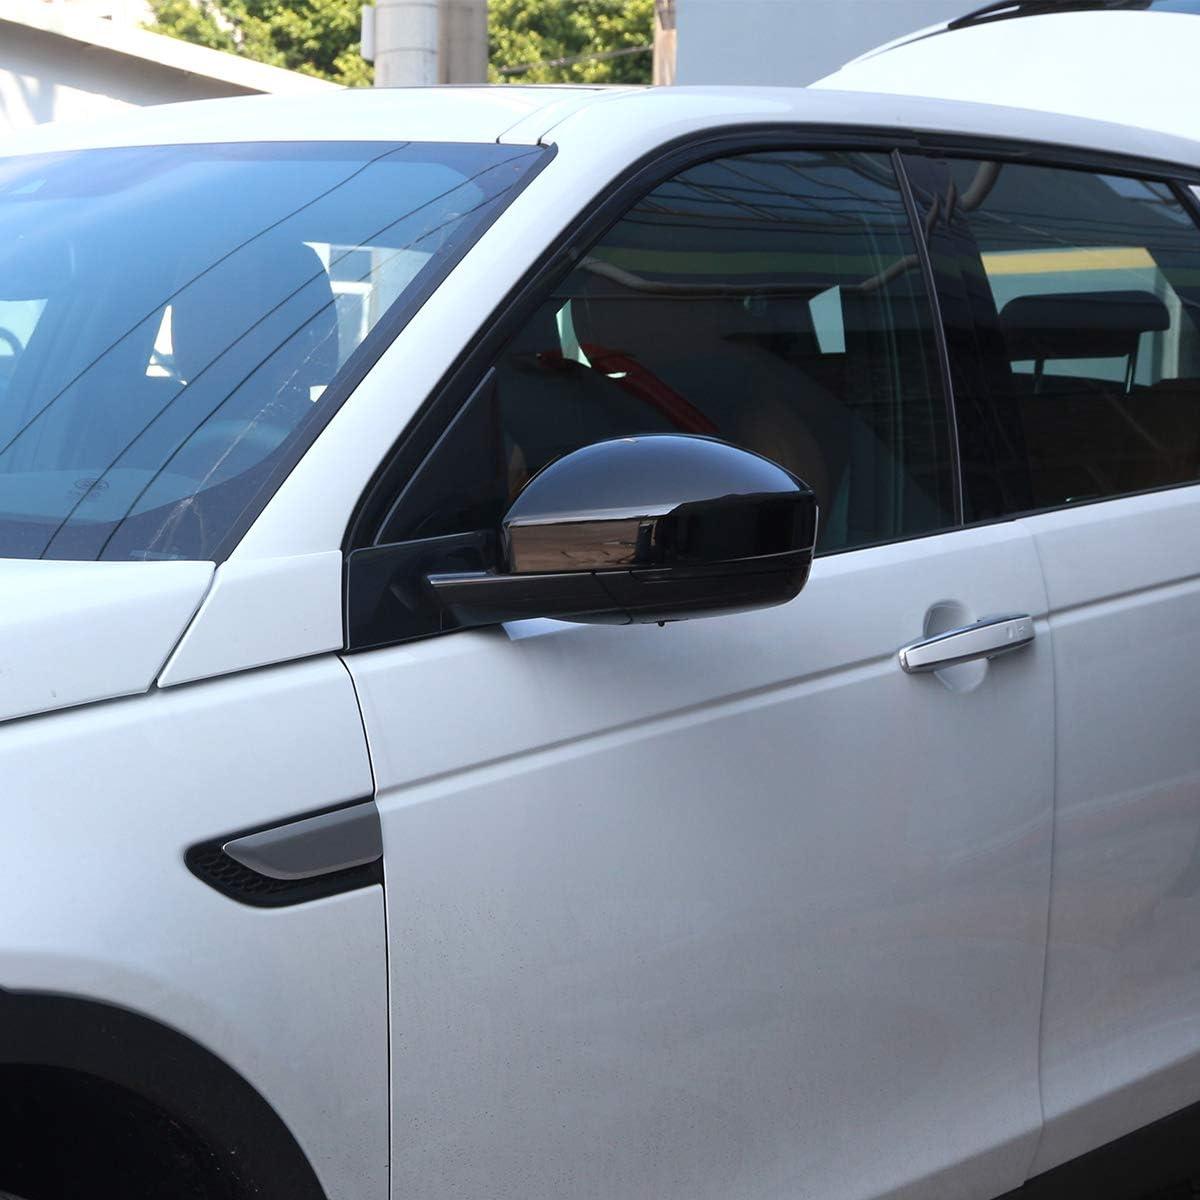 DIYUCAR Car Rearview Mirror Cap Cover Trim For LR Discovery Sport 2015-2019 Glossy Black